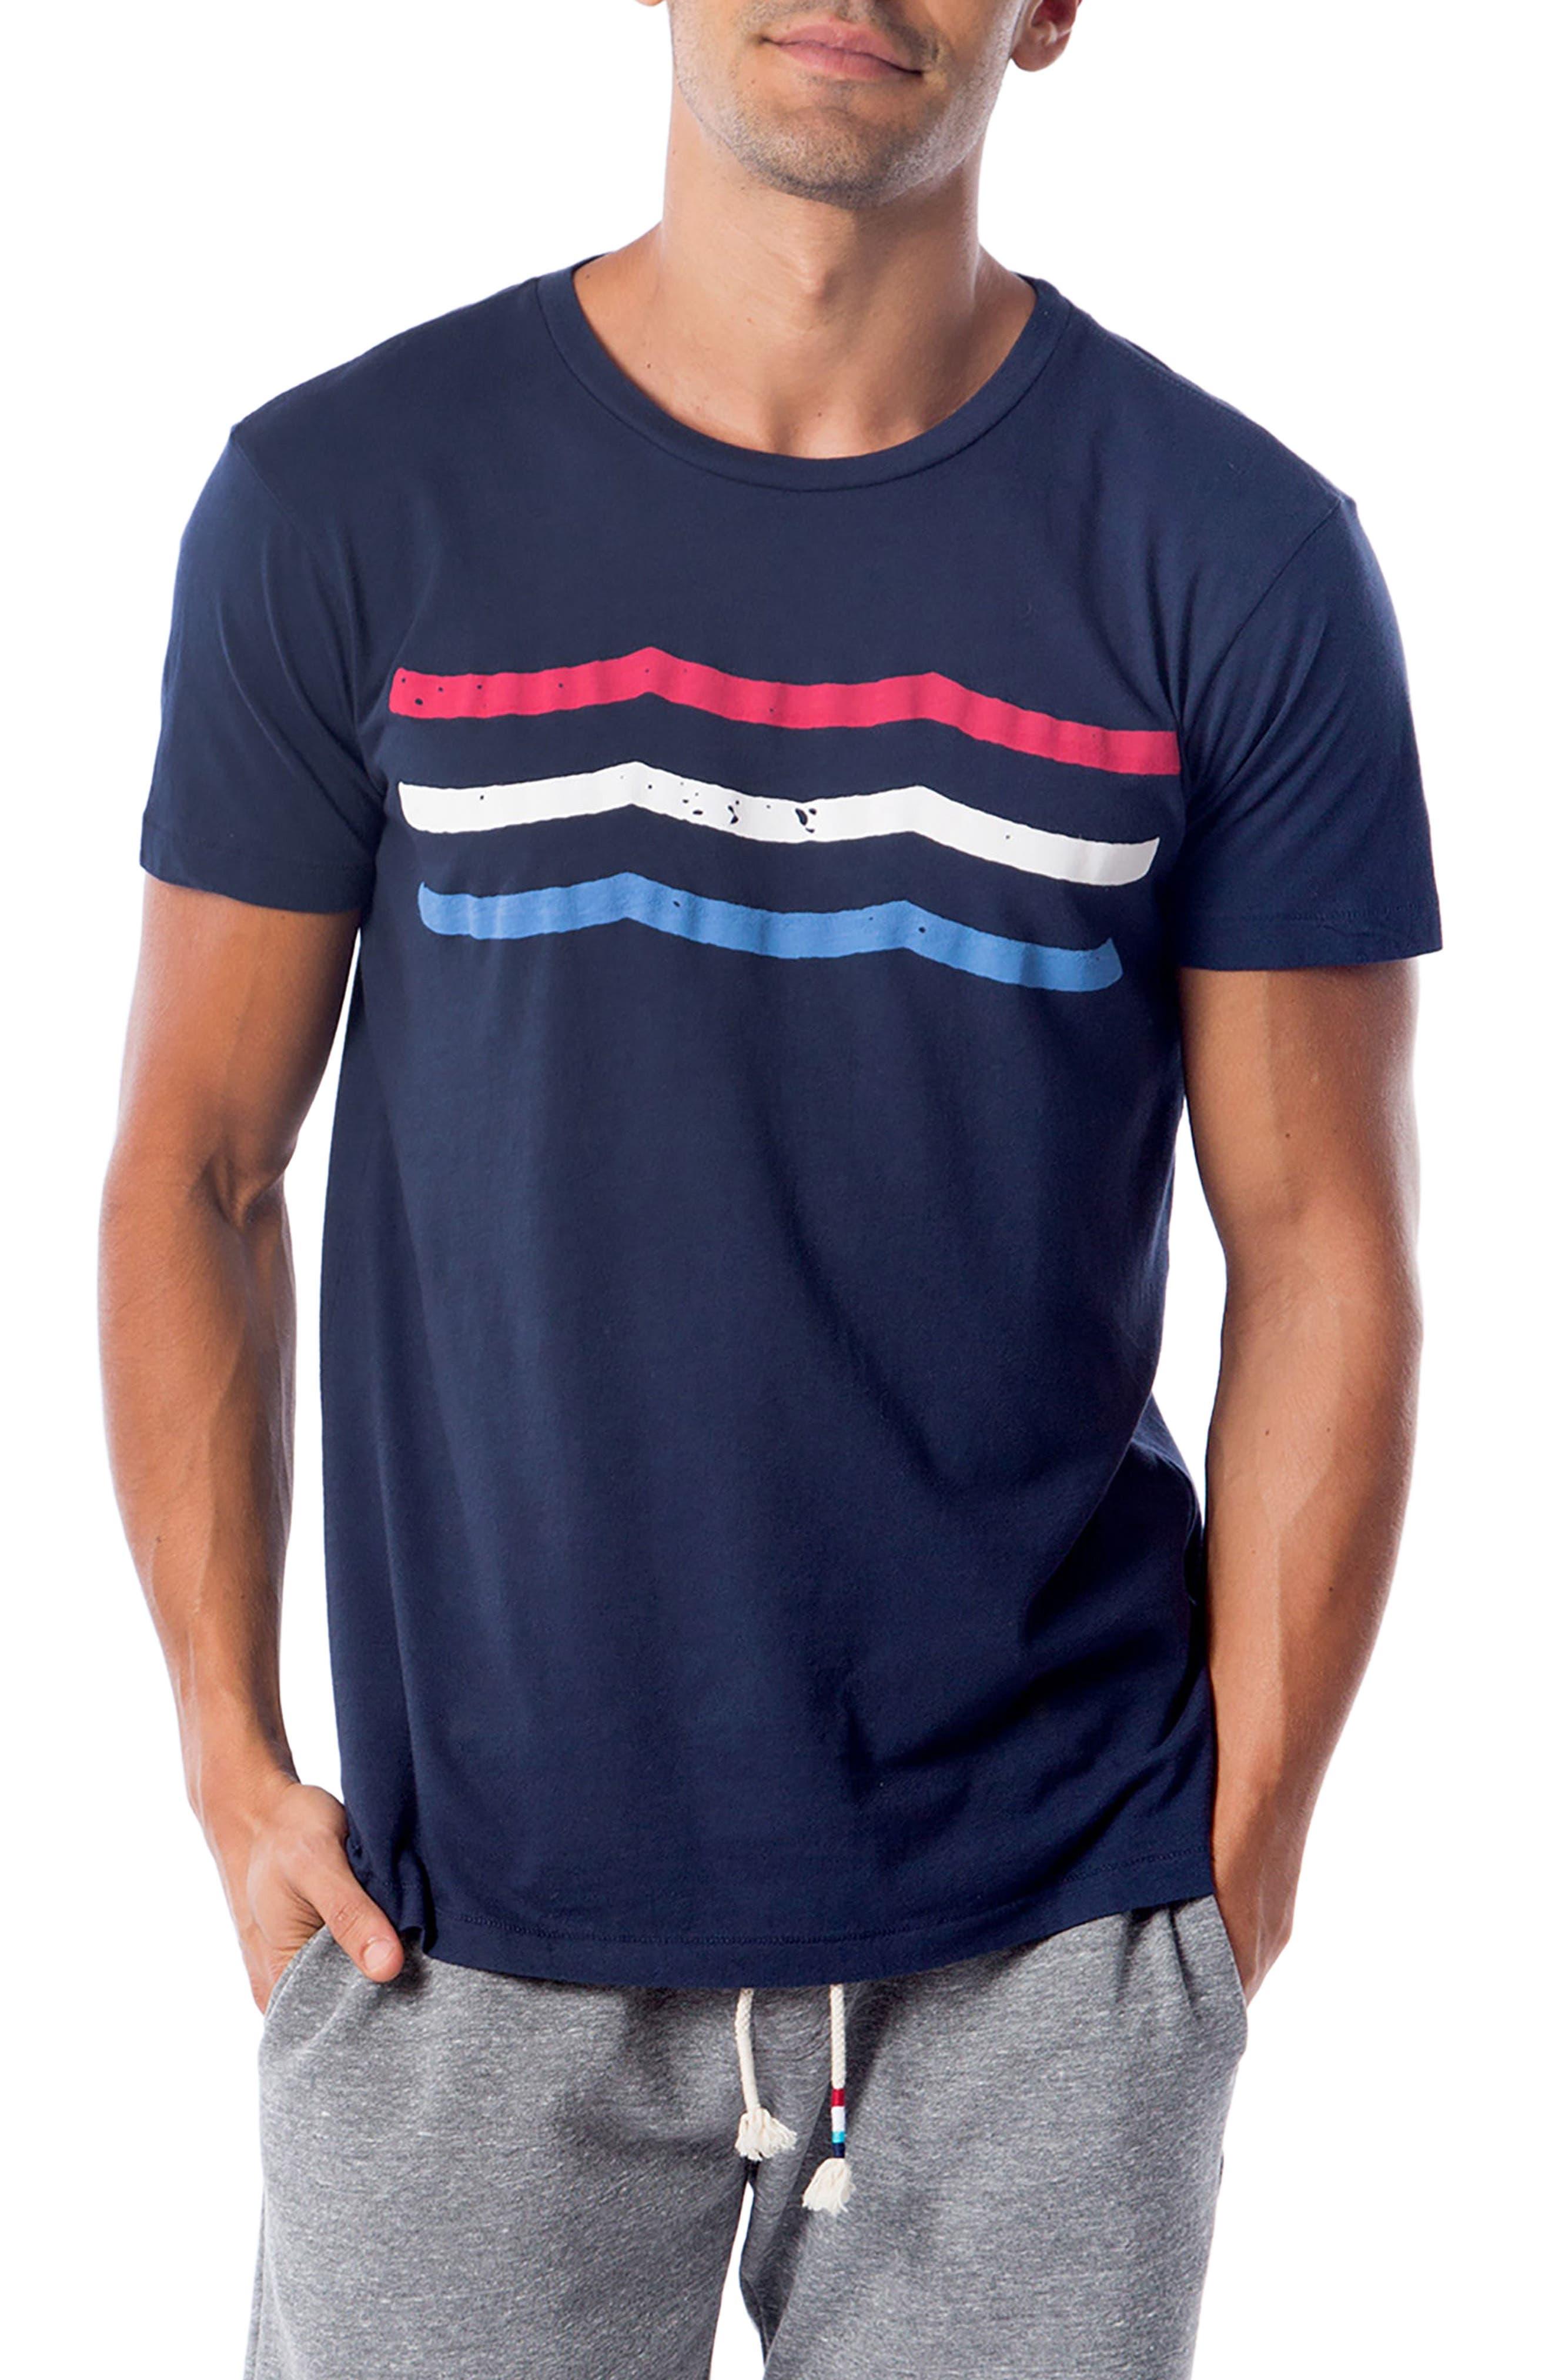 American Waves T-Shirt,                         Main,                         color, Indigo